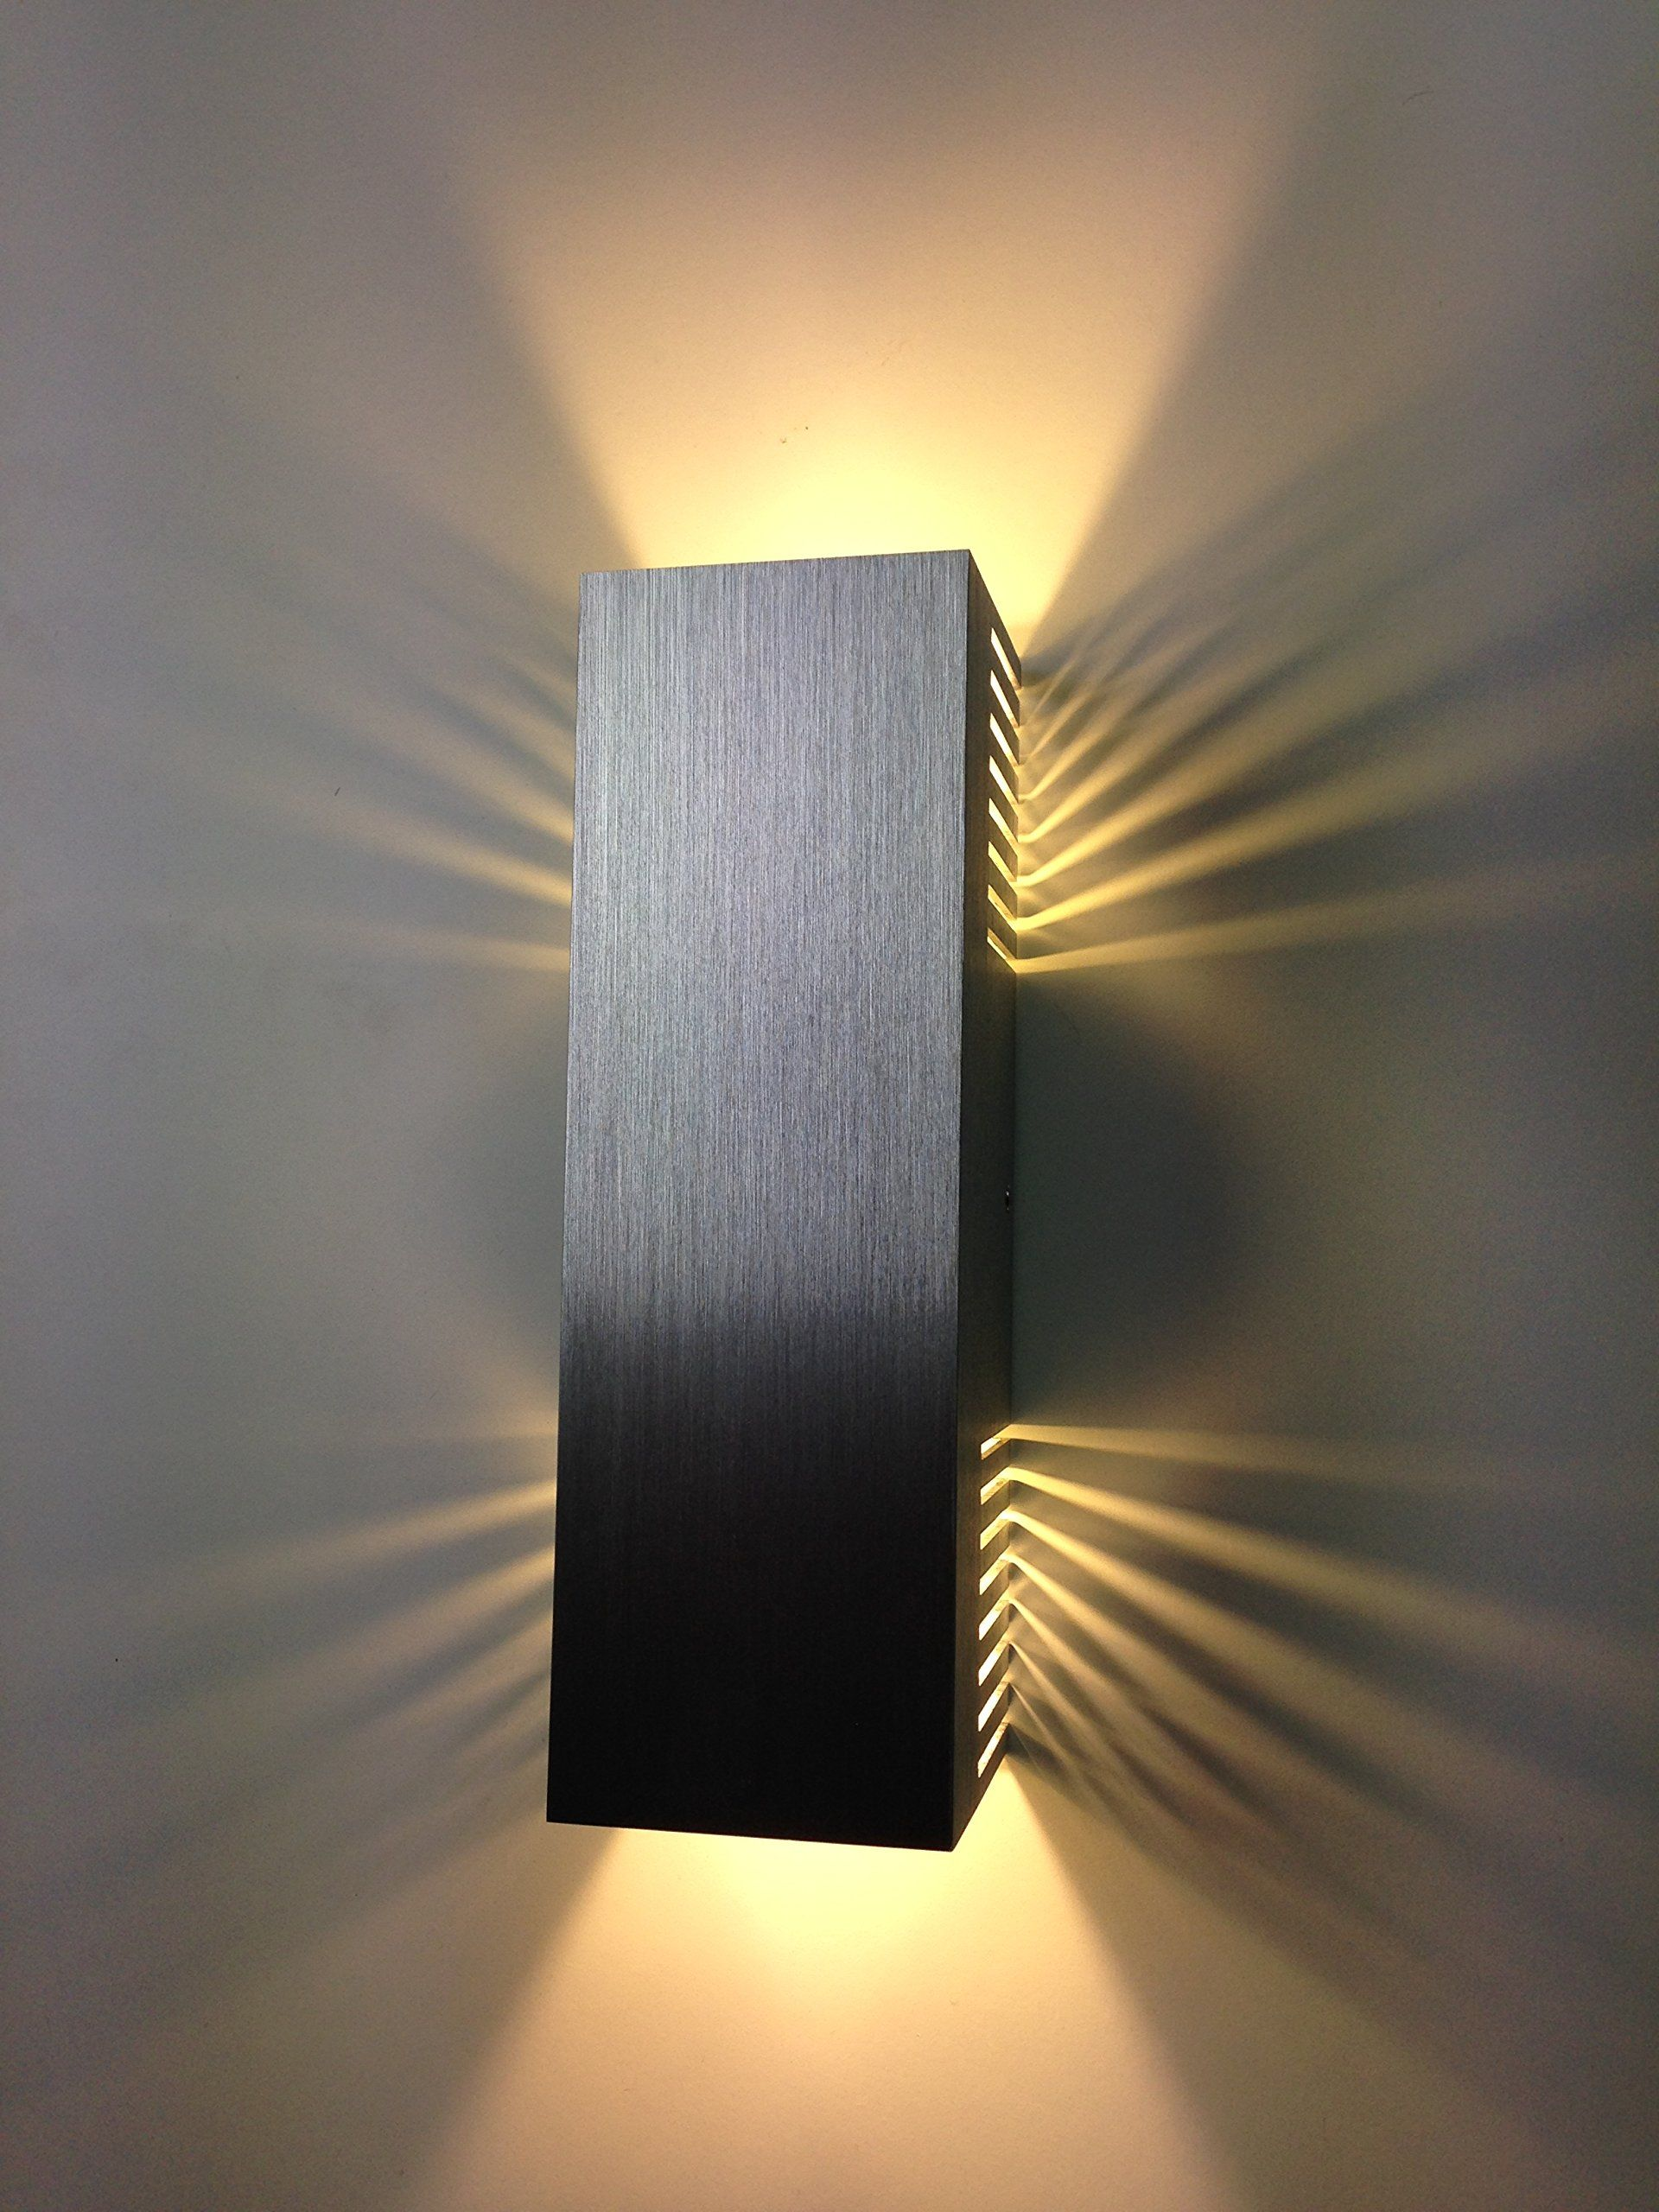 Spiceled wandleuchte shineled 14 2x7w warmwei 14w high - Wandlampe indirekte beleuchtung ...